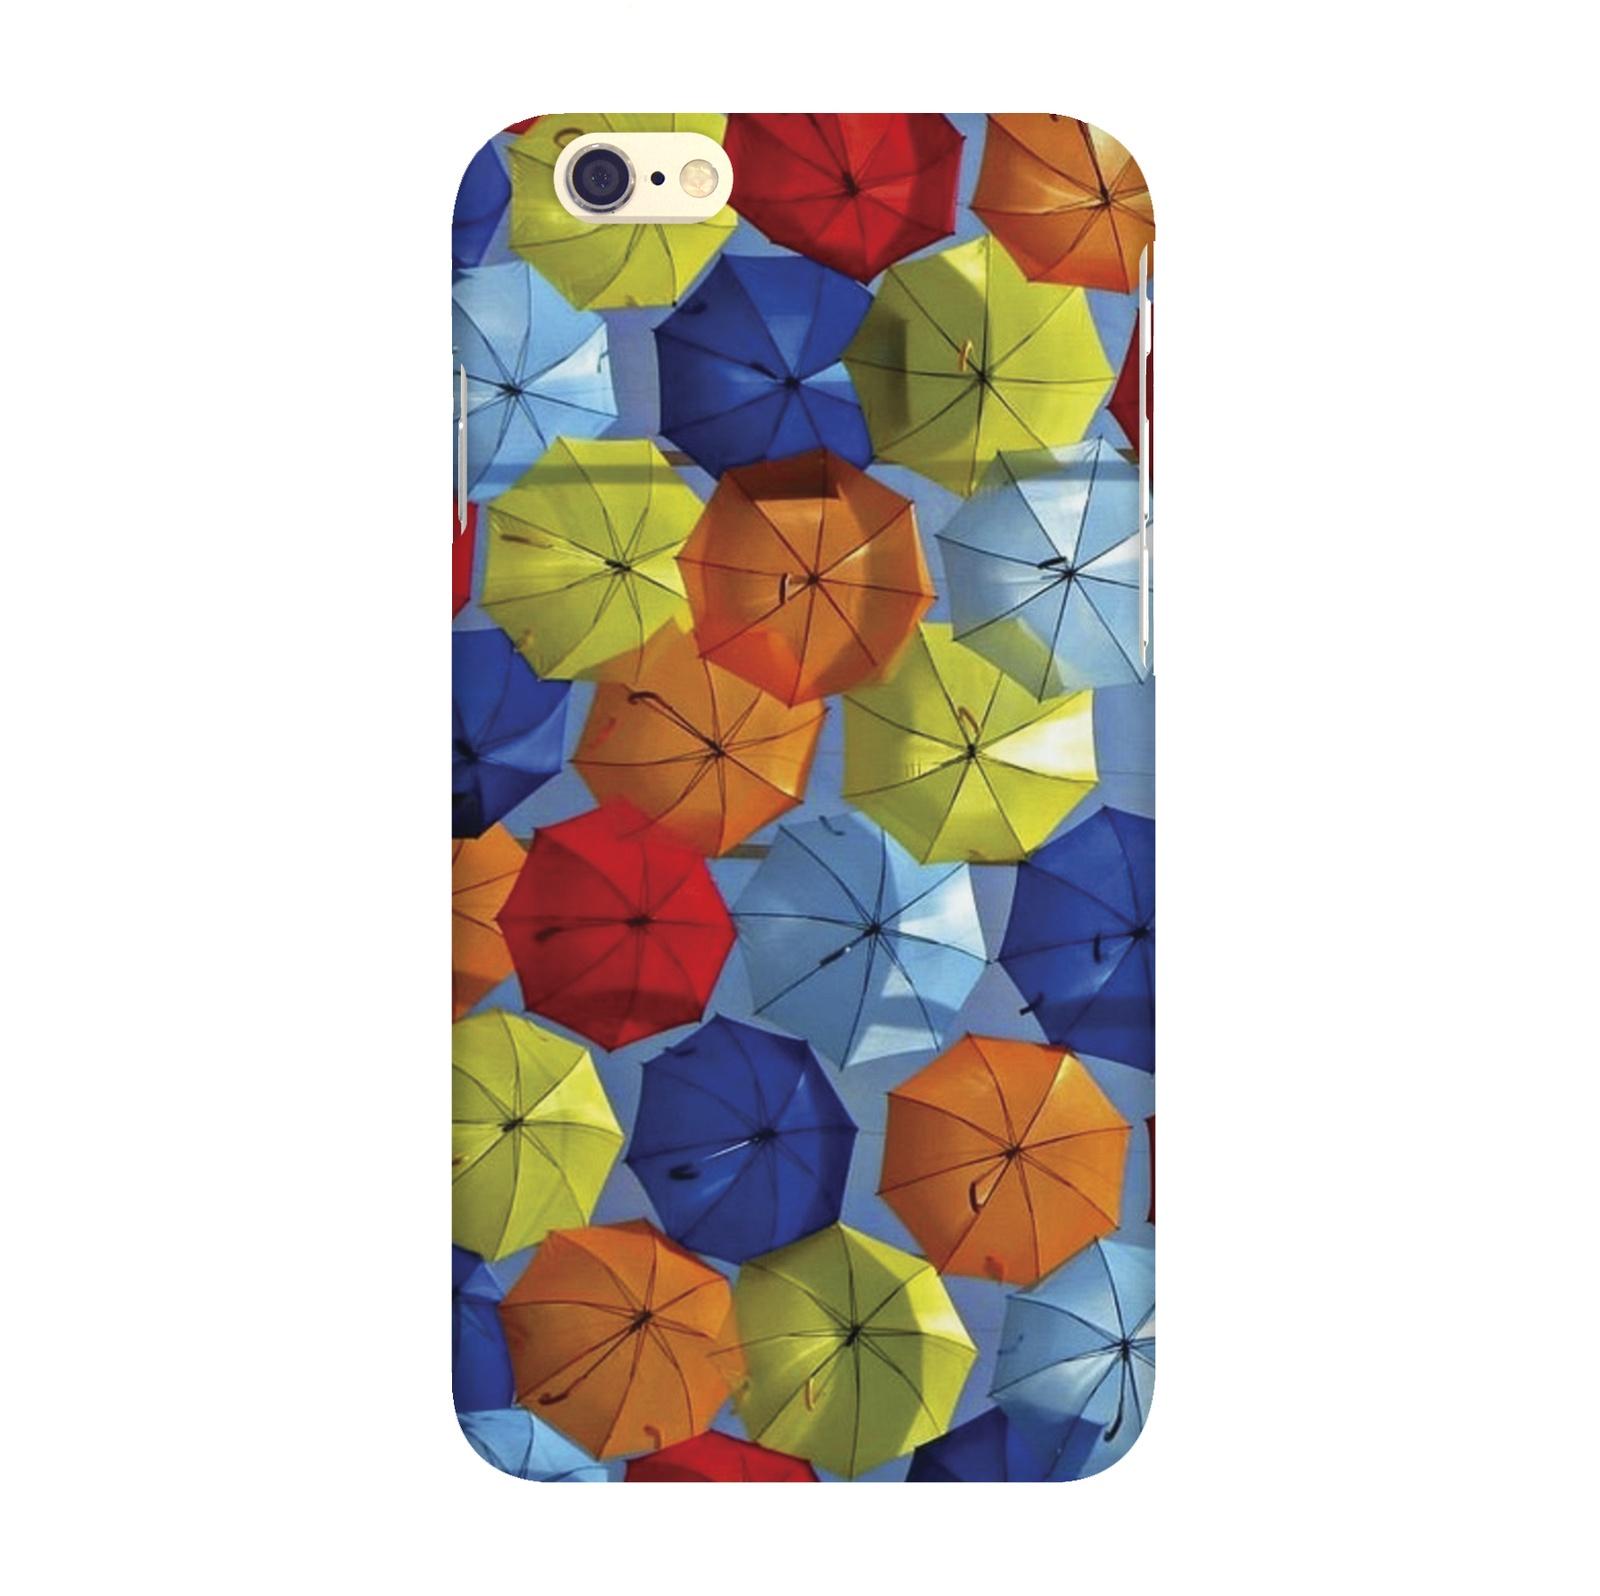 Чехол для Iphone 6 Зонтики IP6.MITYA-261 цена и фото